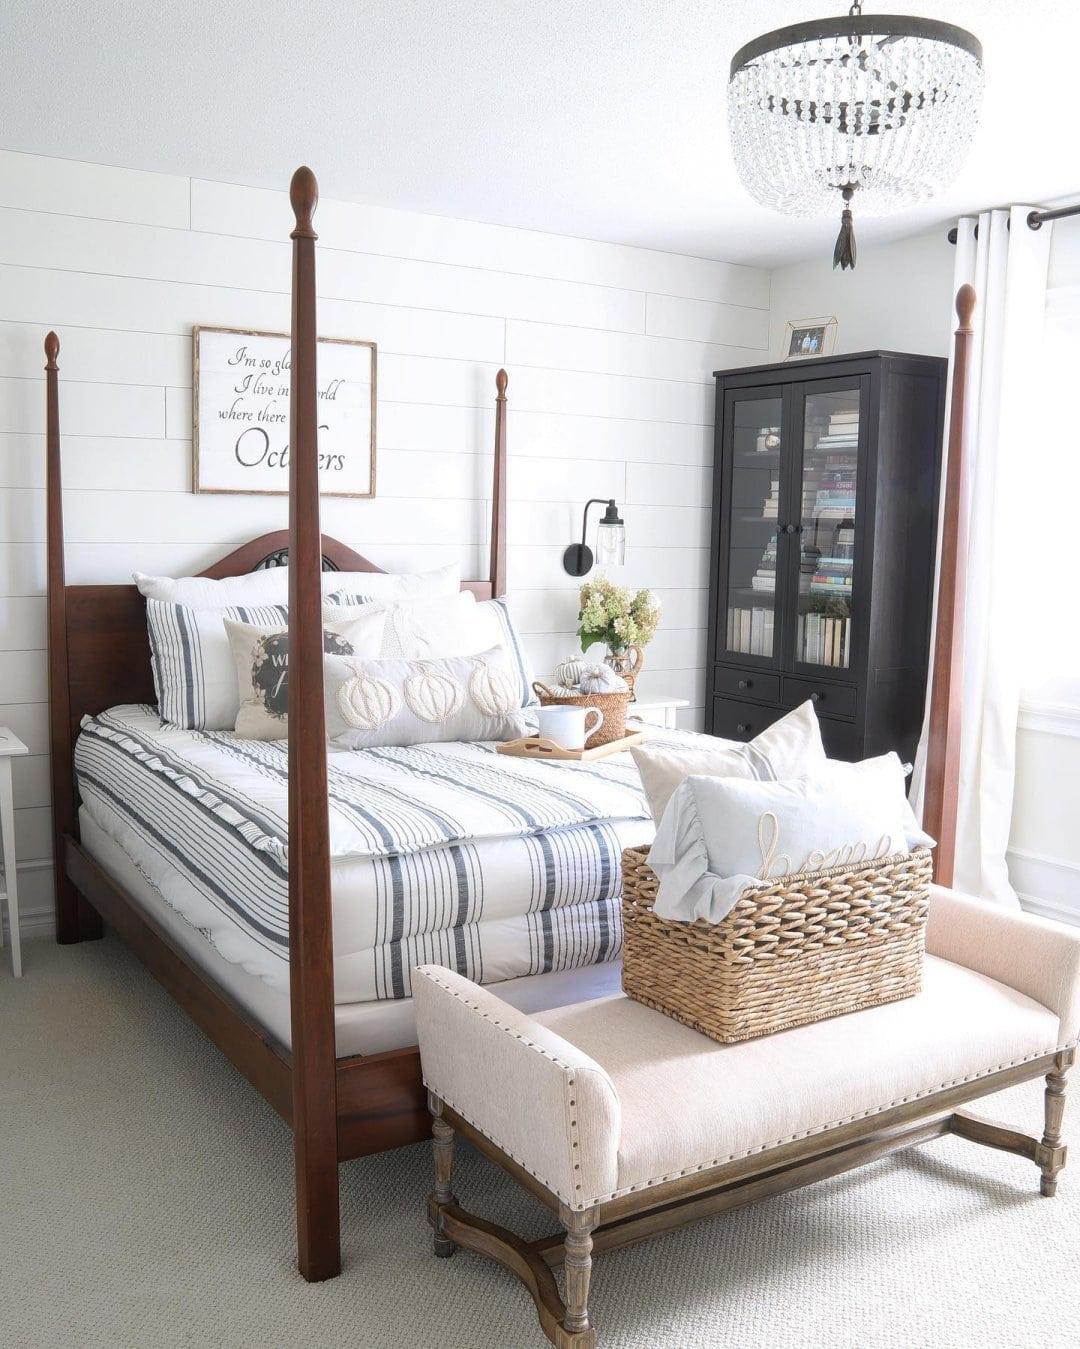 A Cool And Coastal Bedroom